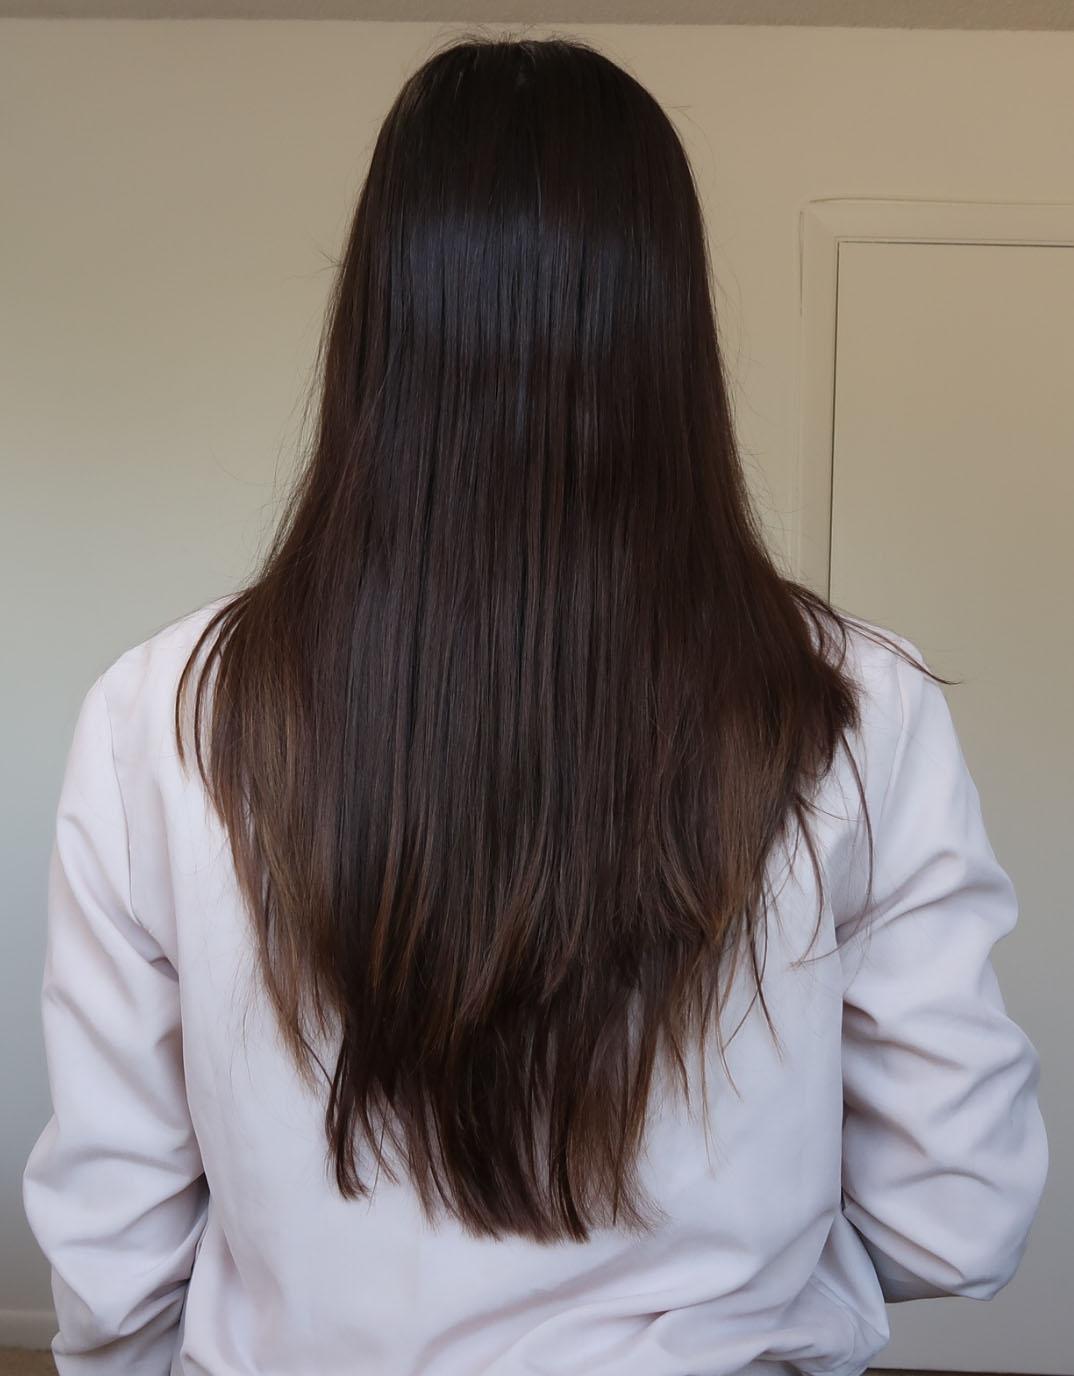 Hair botox after